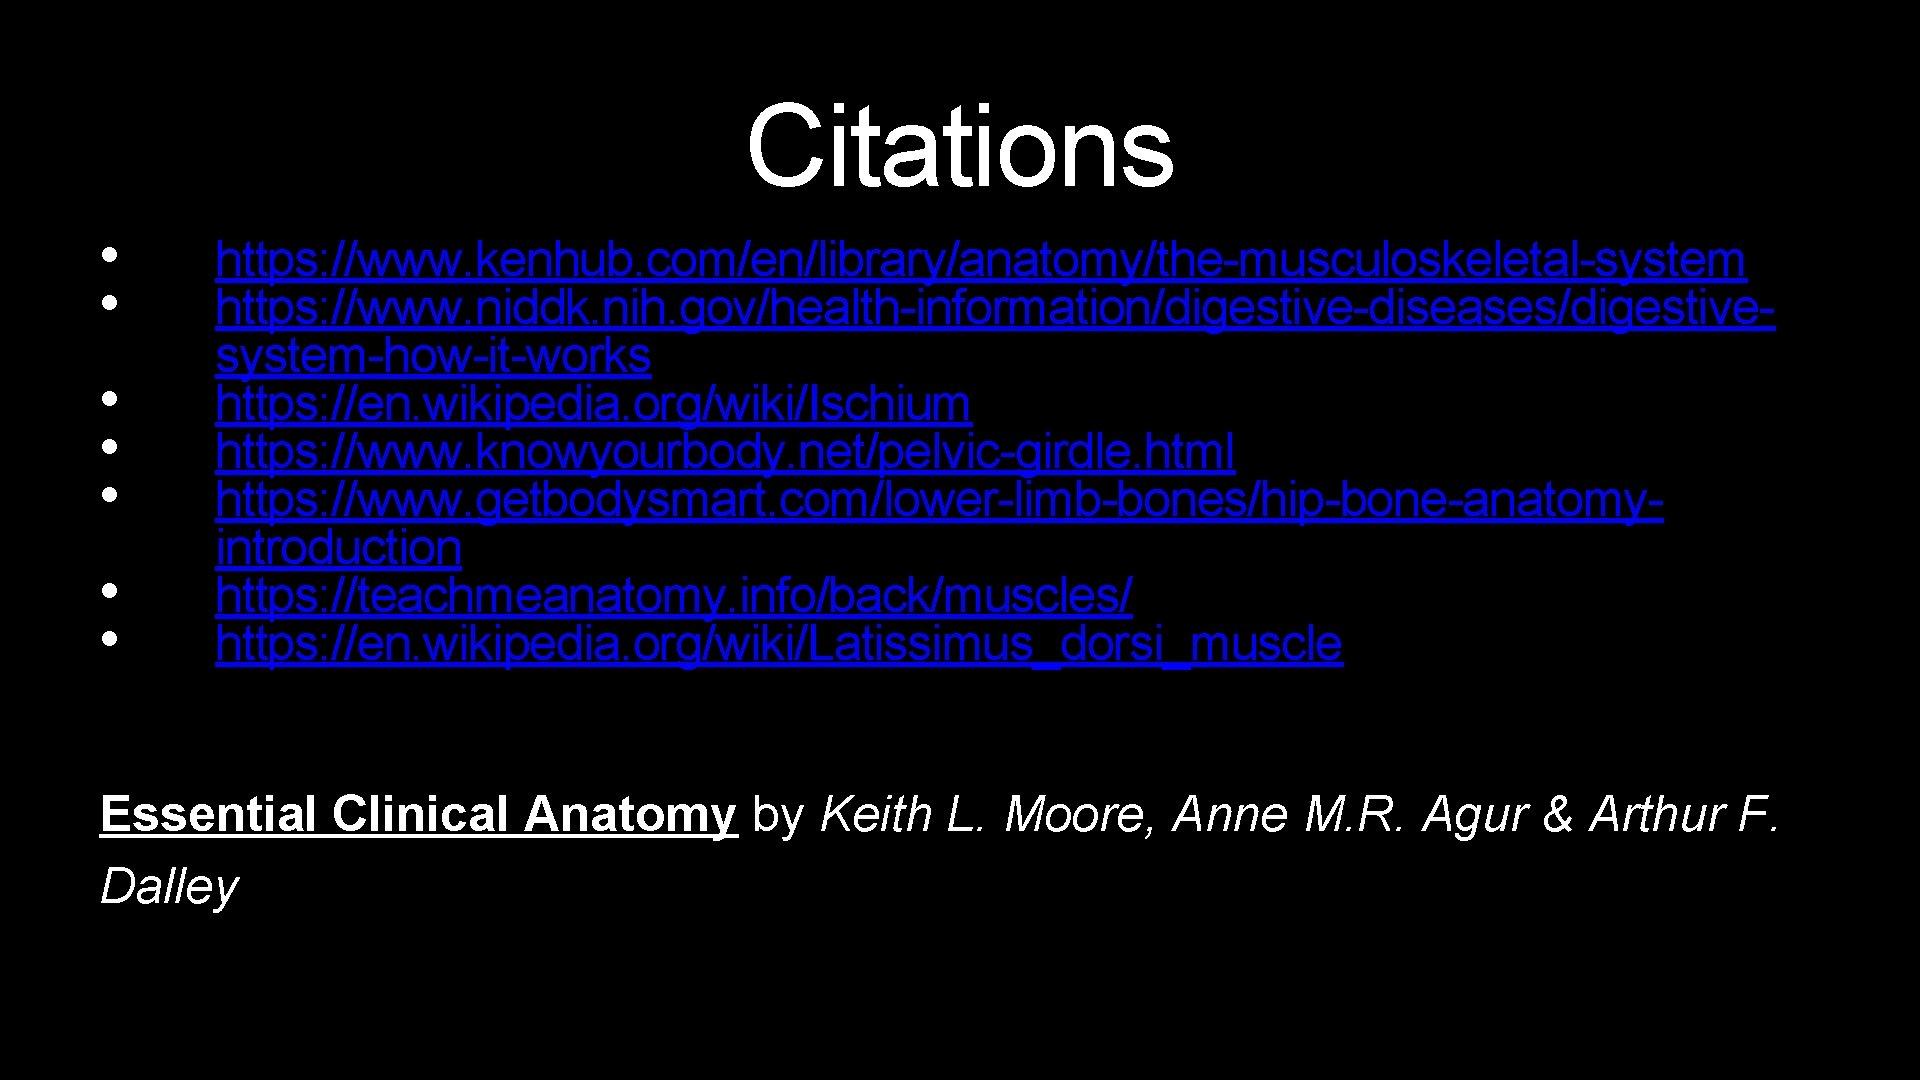 Citations • • https: //www. kenhub. com/en/library/anatomy/the-musculoskeletal-system https: //www. niddk. nih. gov/health-information/digestive-diseases/digestivesystem-how-it-works https: //en.